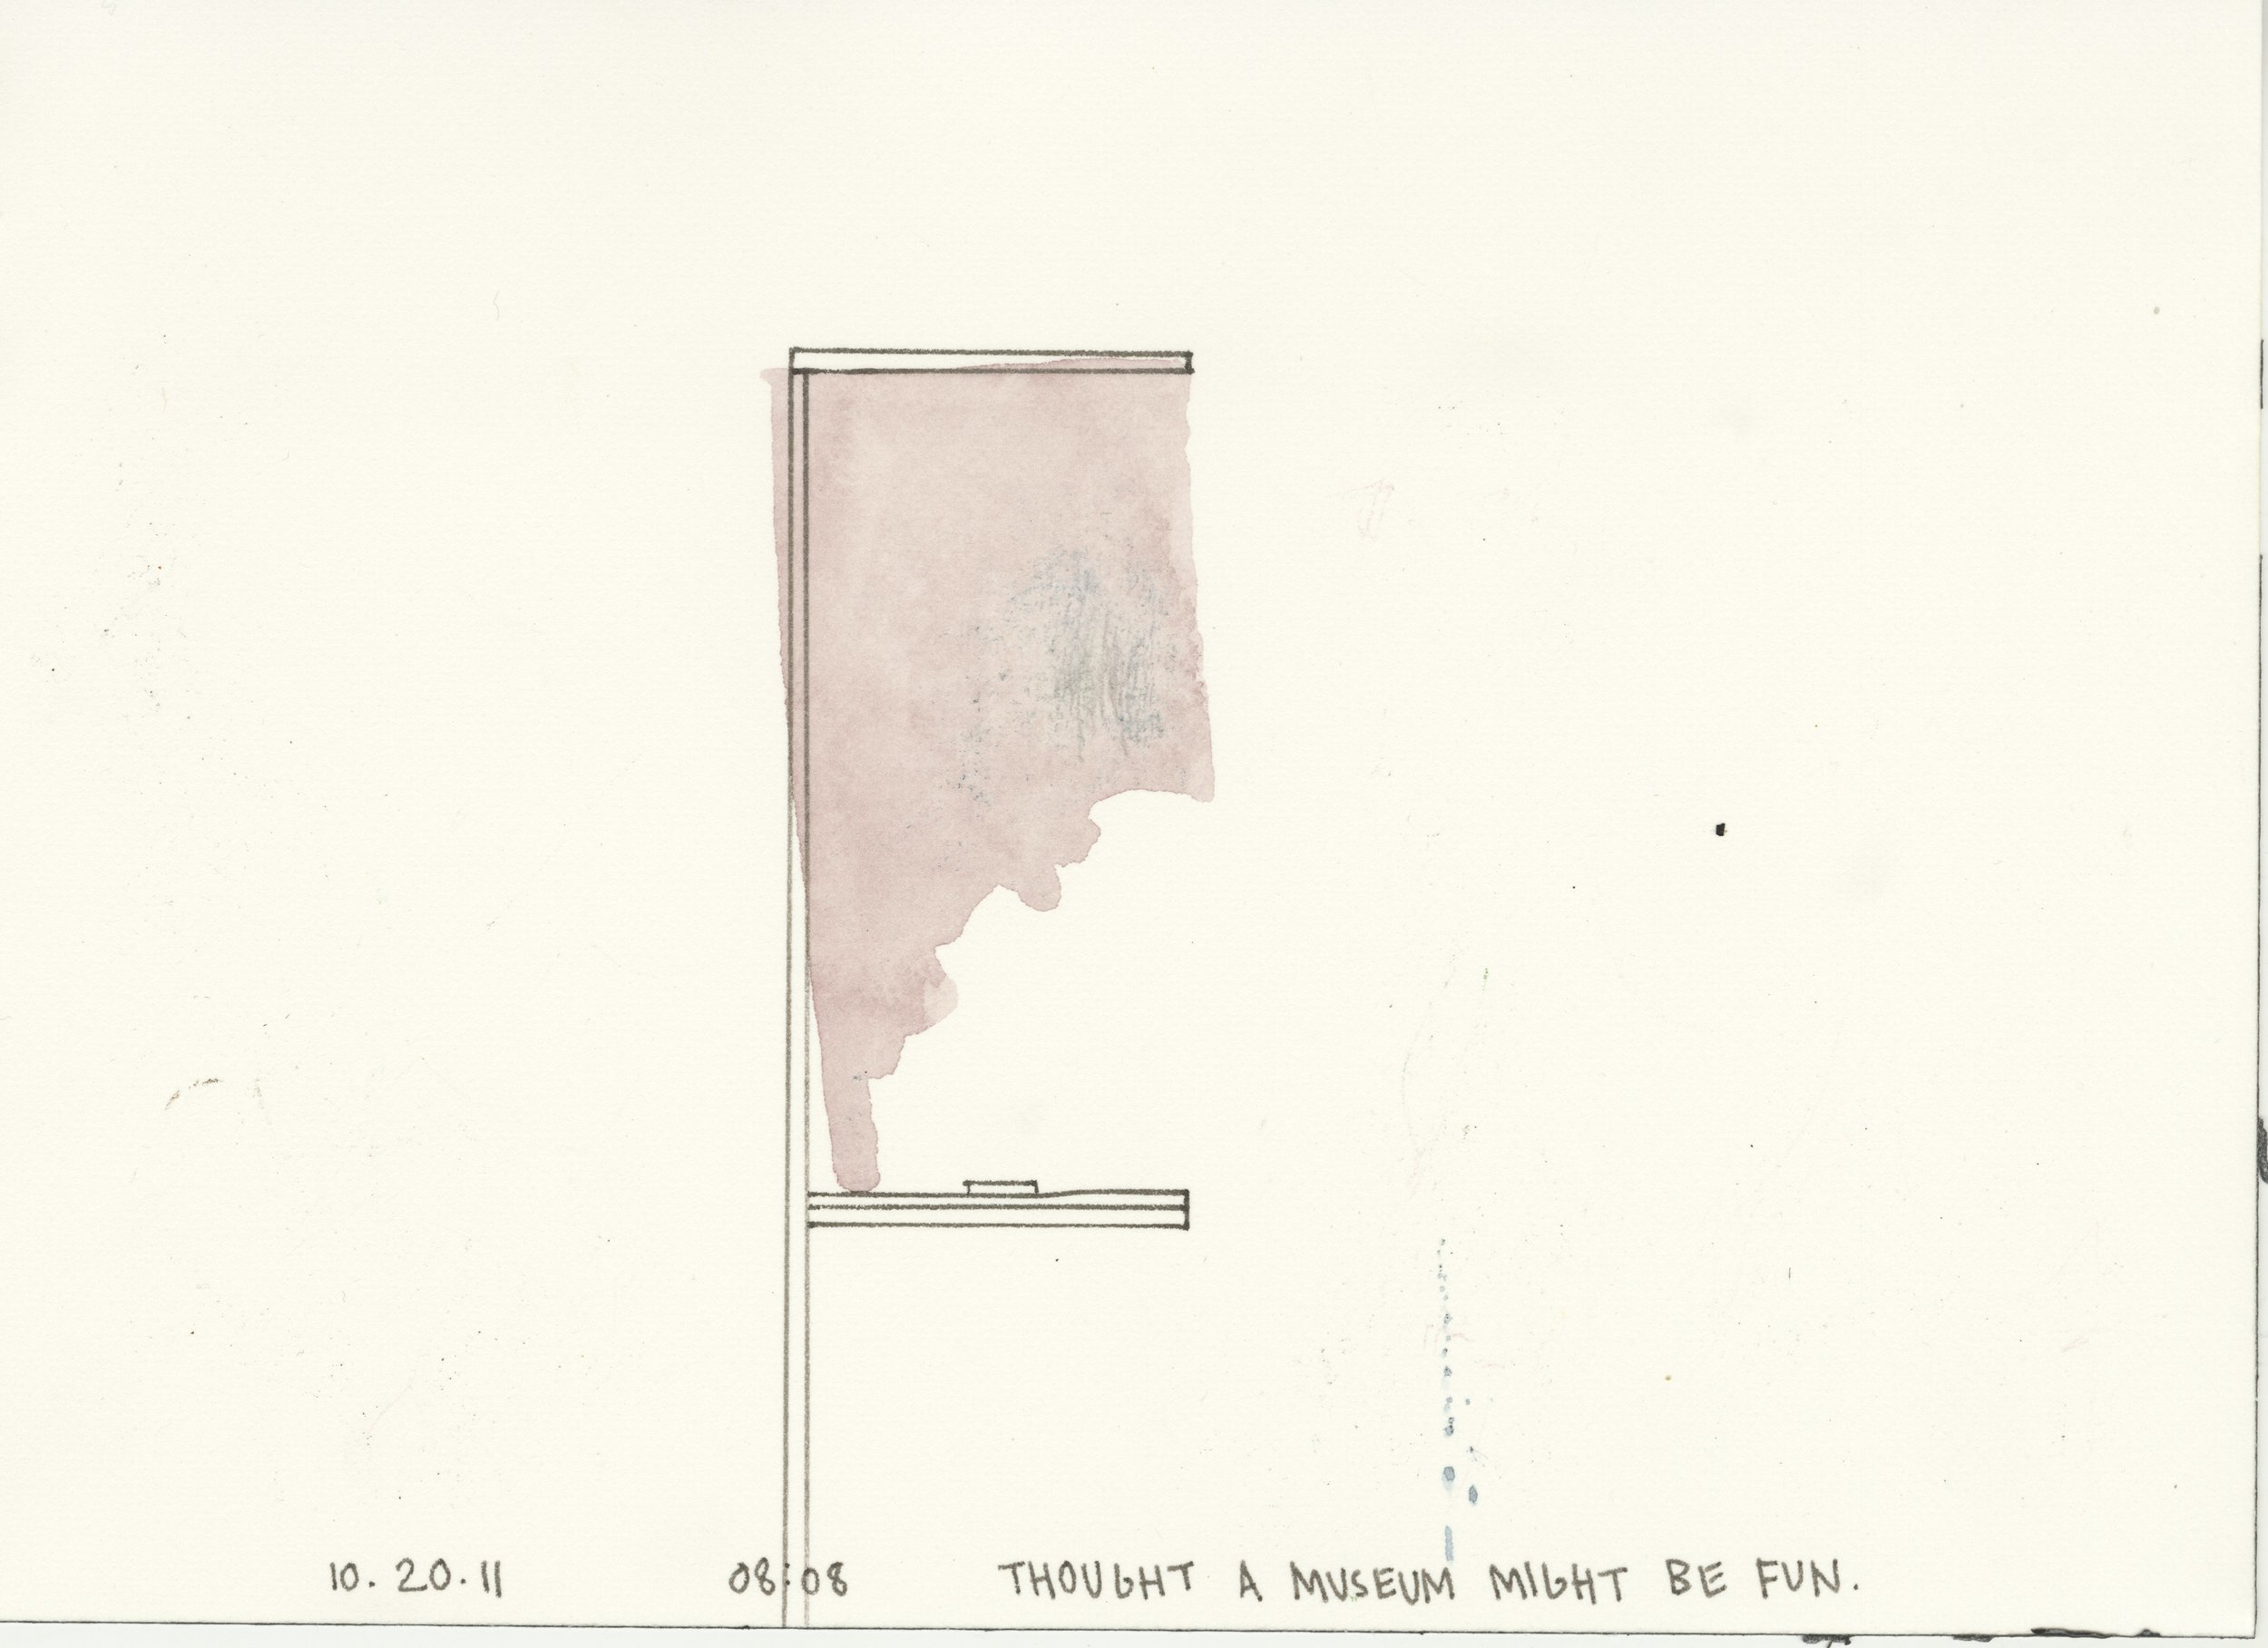 2011-10-21 drawing06.jpg